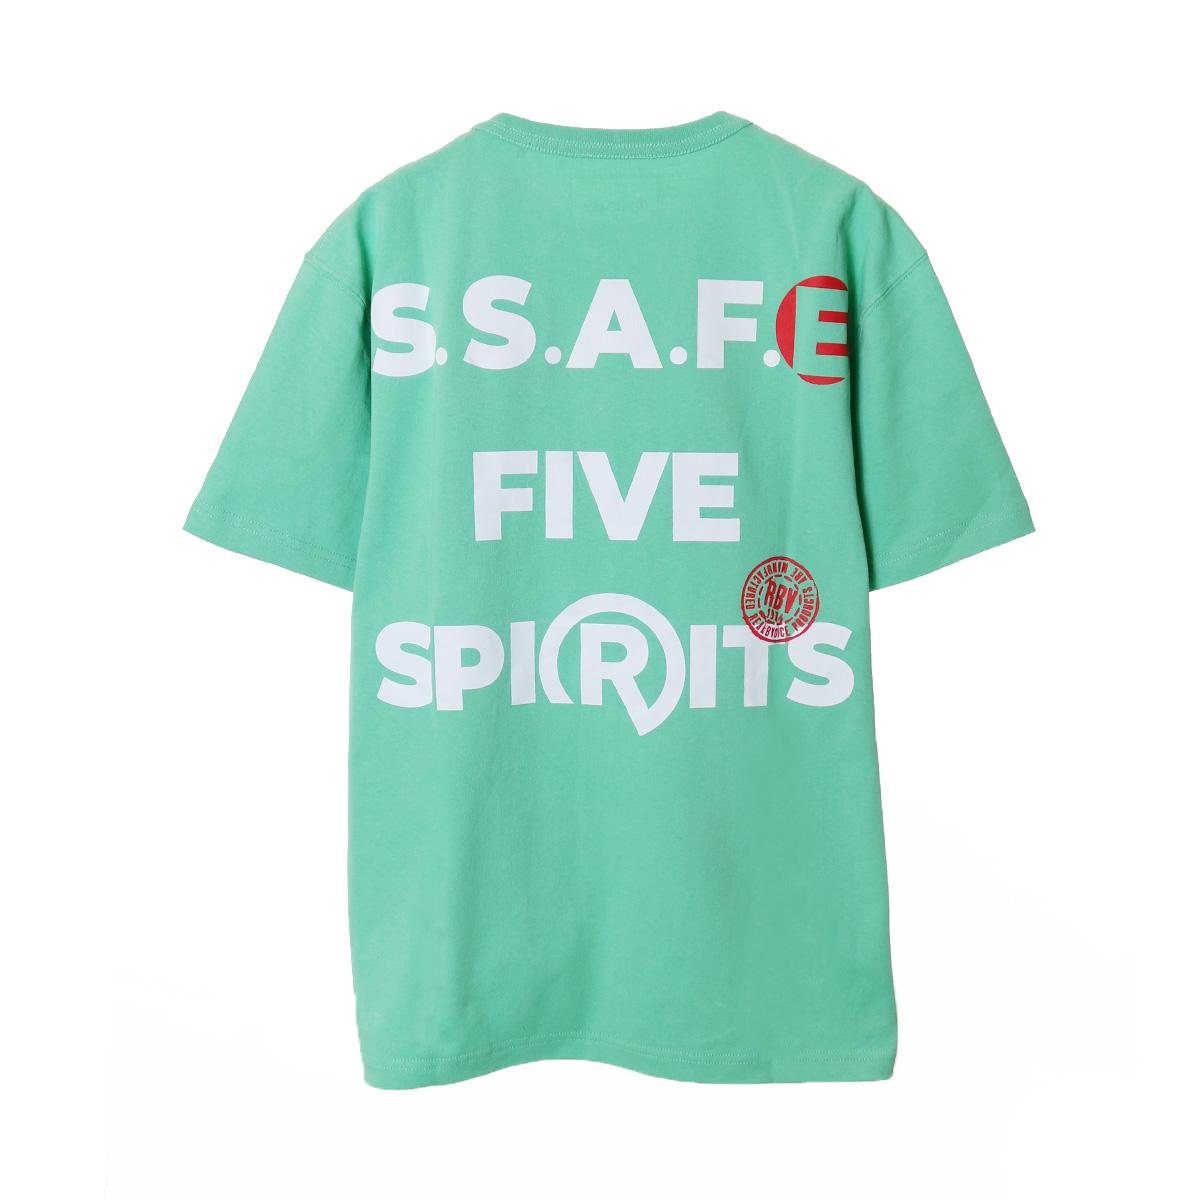 S.S.A.F.E VARIATION T-SHIRT